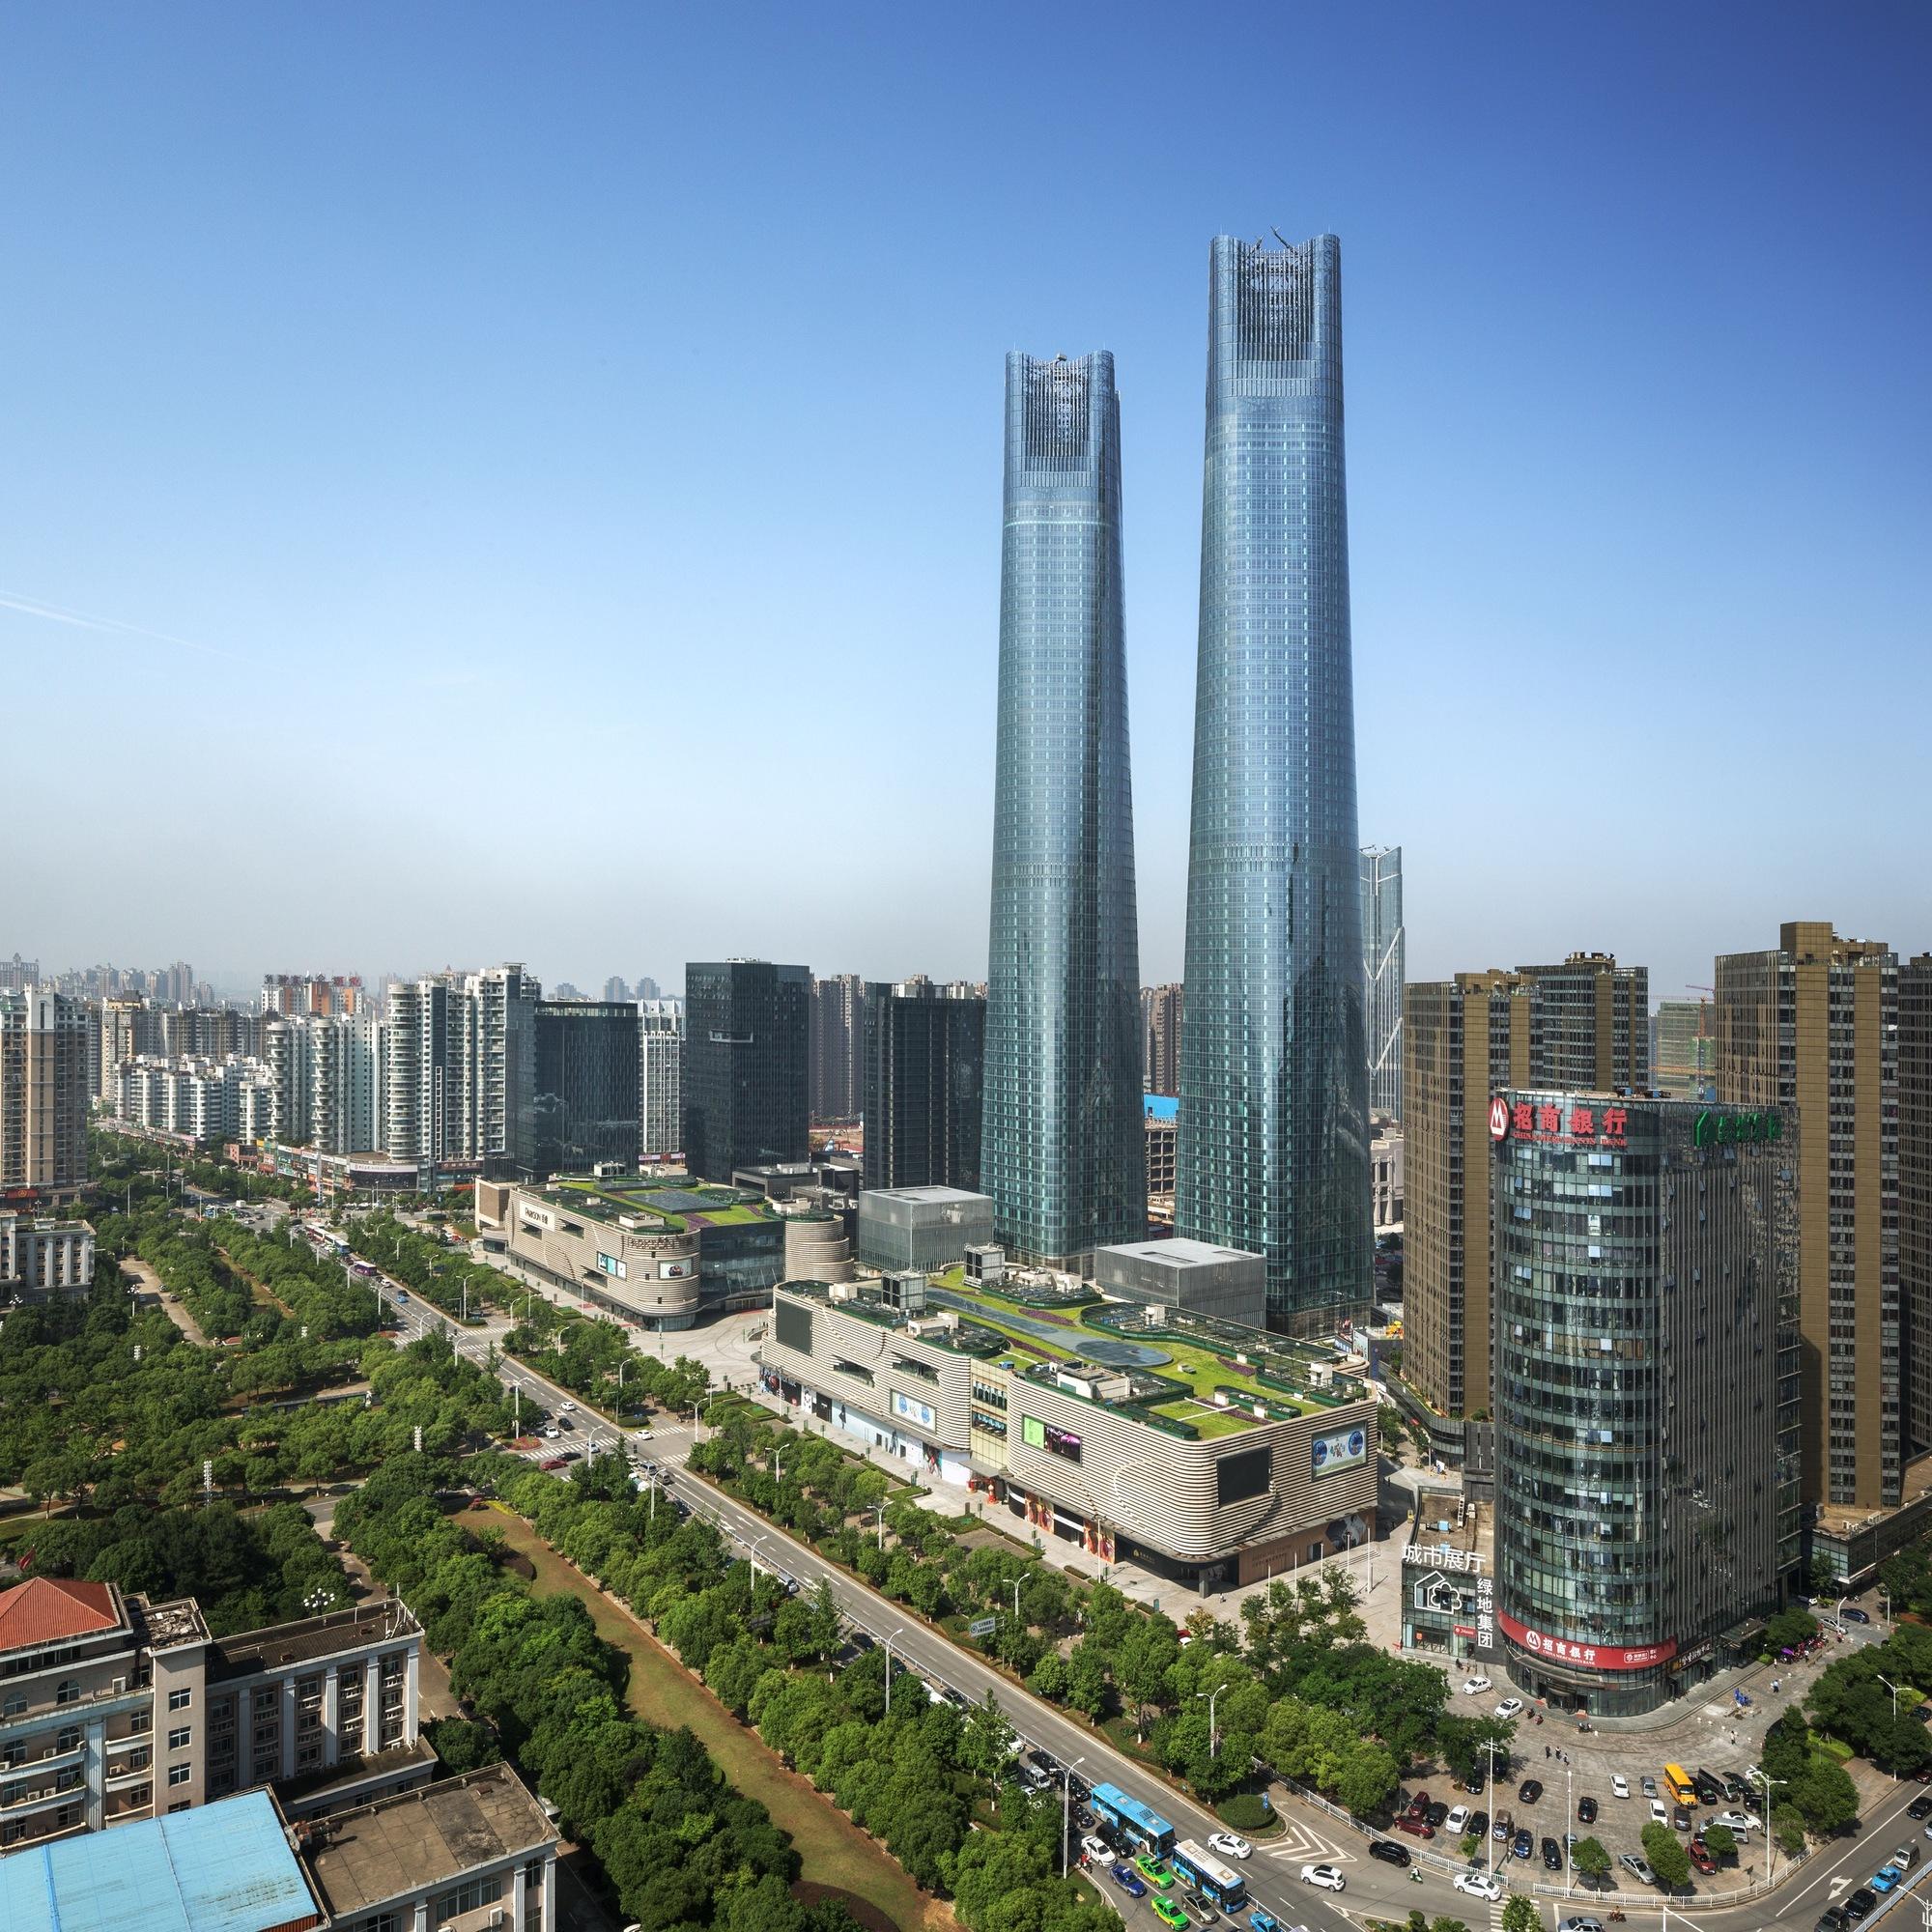 Shanghai Tower Wins 2015 Emporis Skyscraper